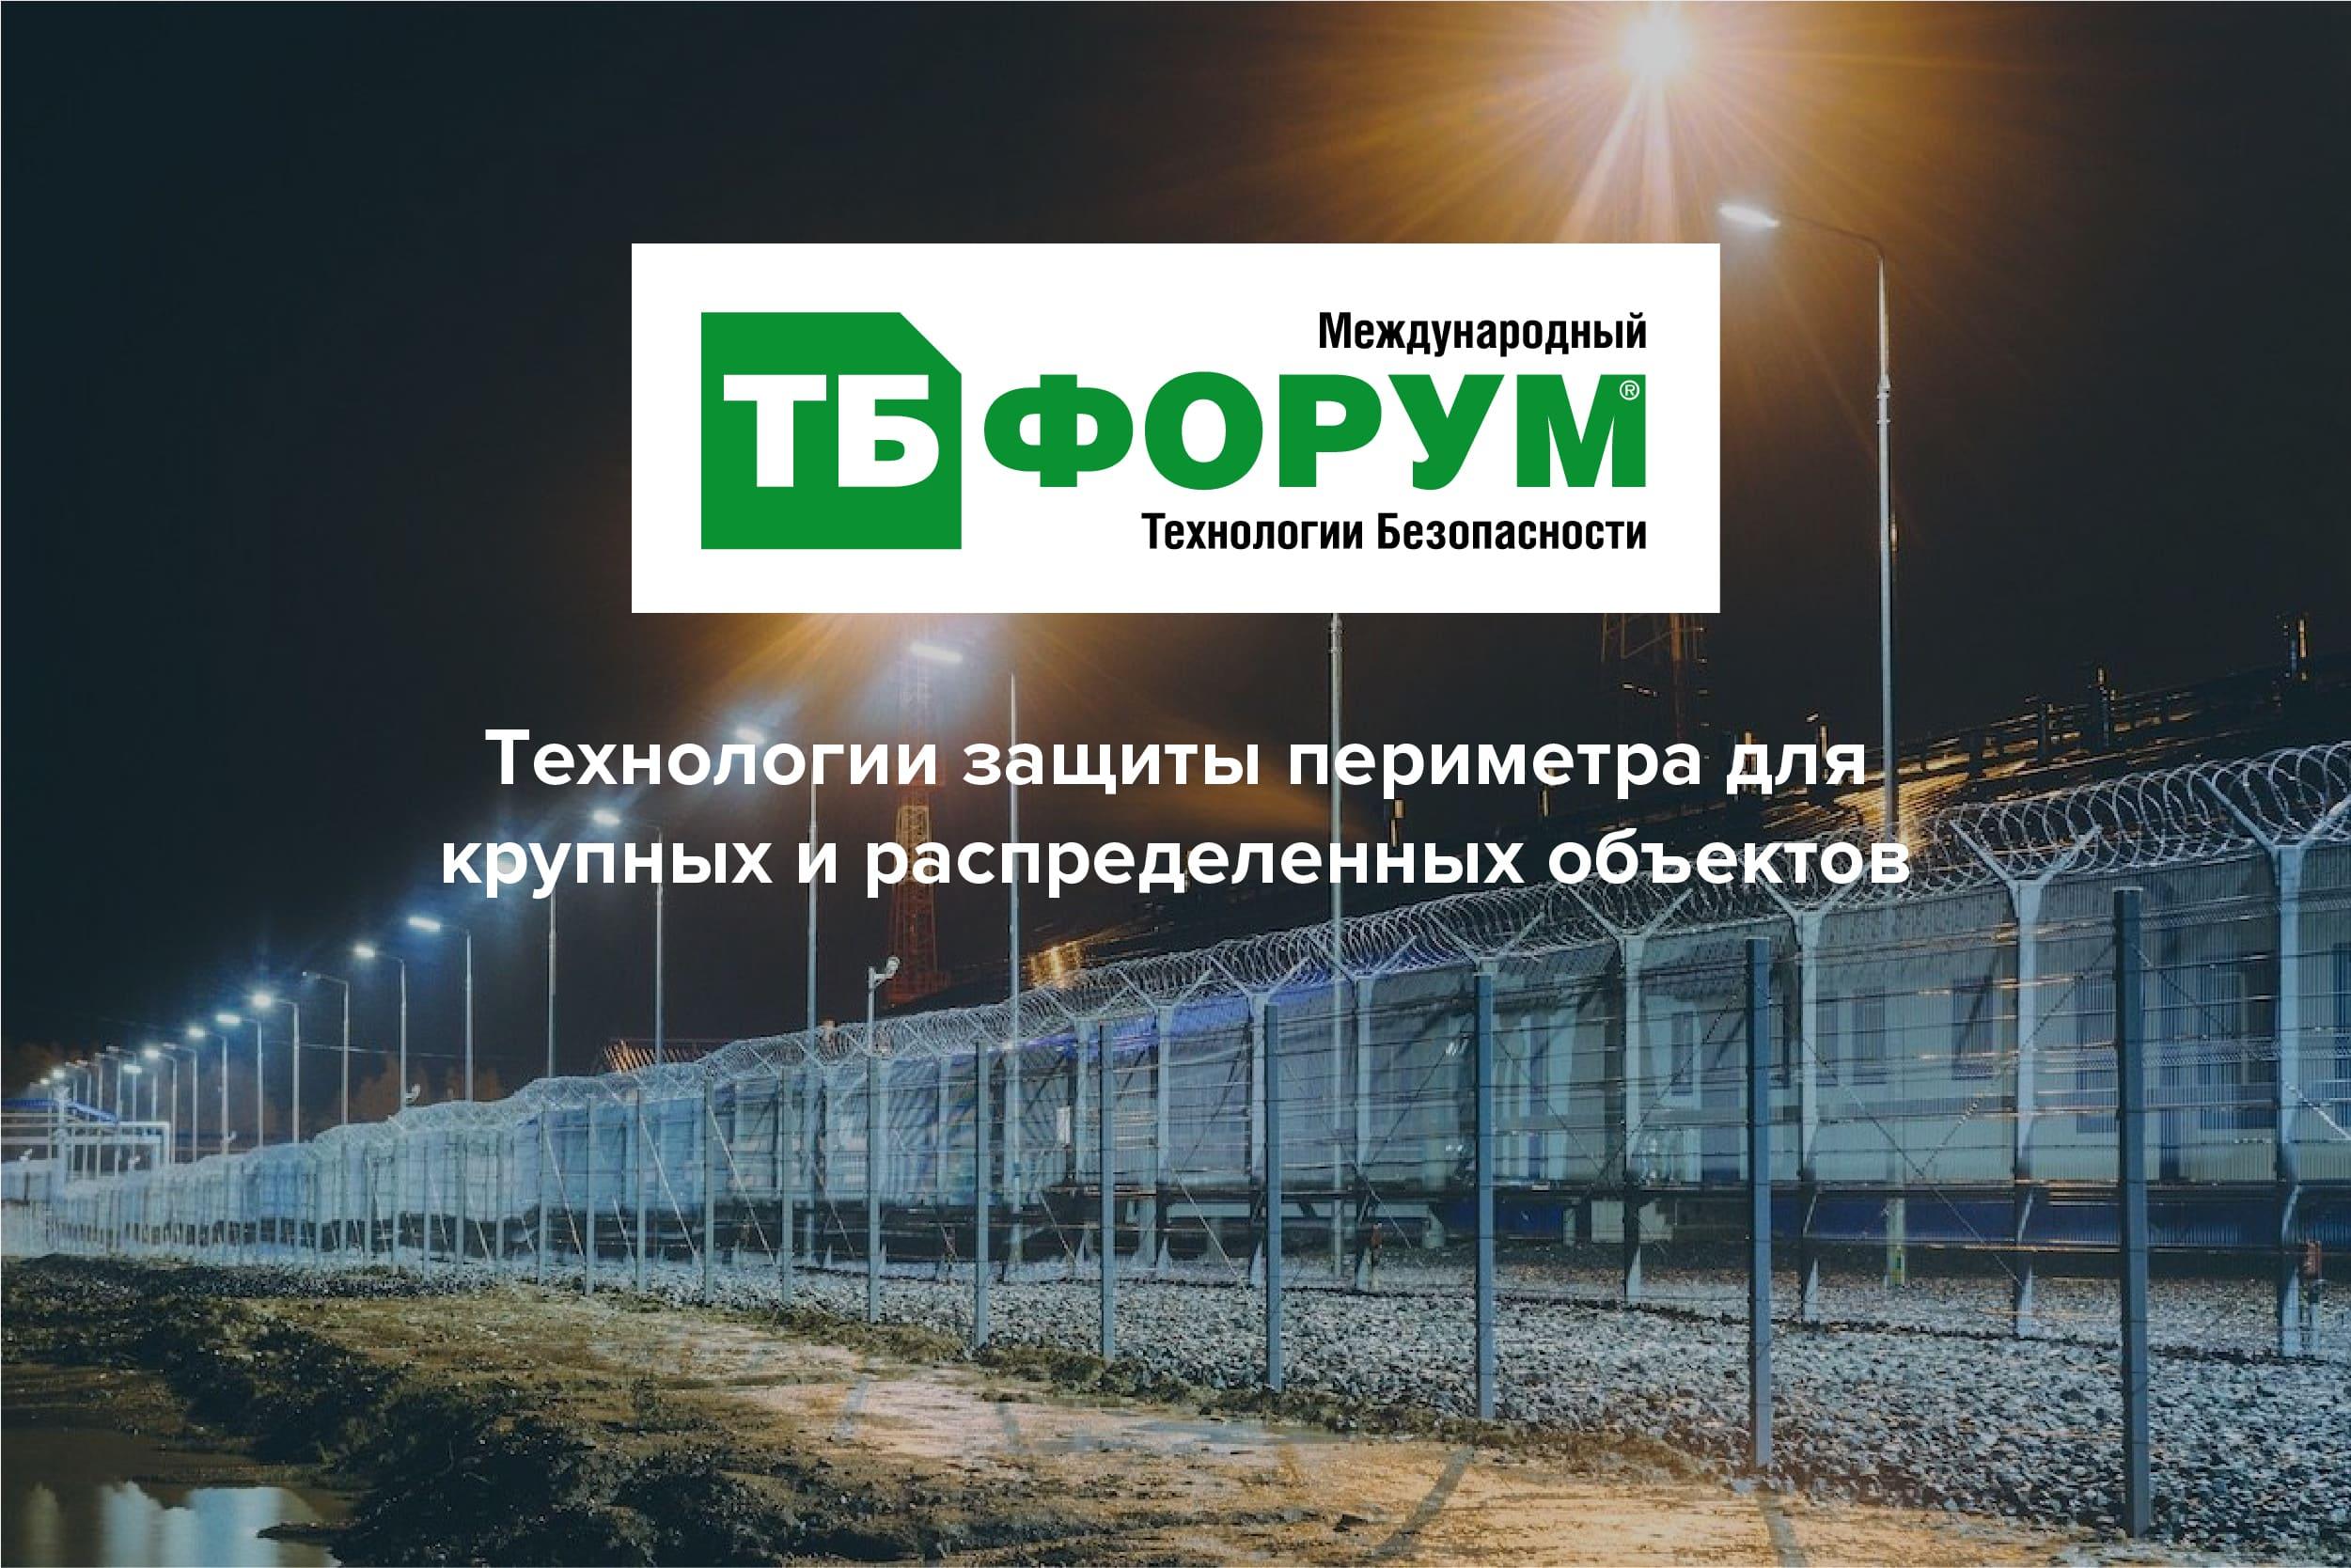 Биометрия всистемах безопасности предприятий: RecFaces выступили наТБ Форуме от«Гротек»